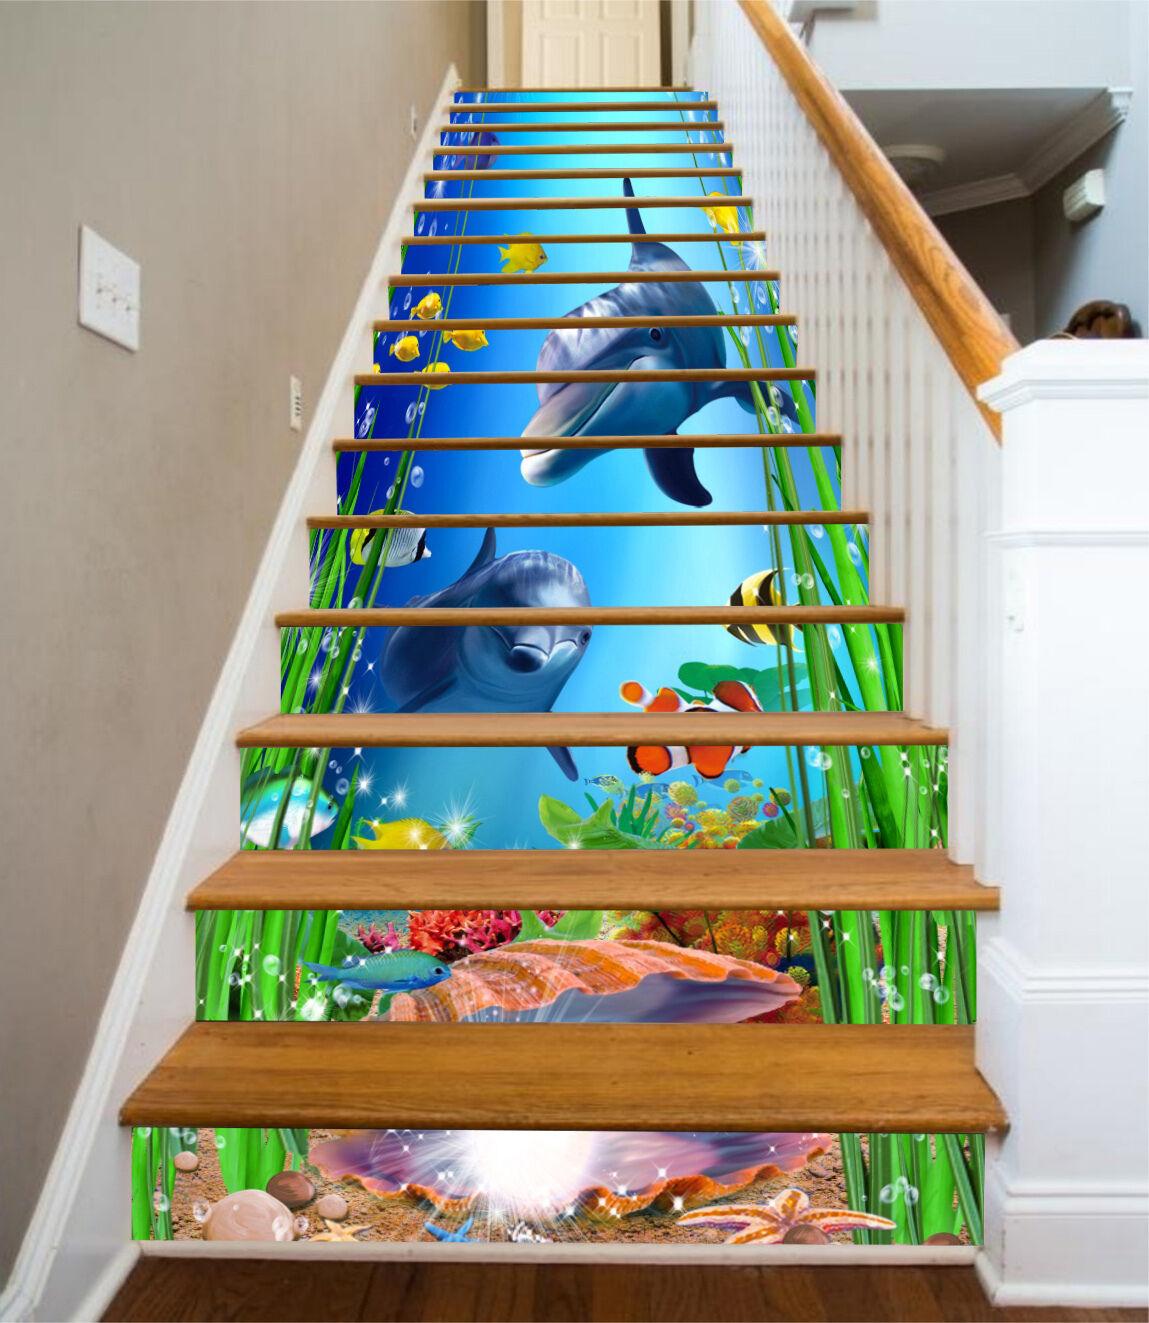 3D Perle Ozean 73 Stair Risers Dekoration Fototapete Vinyl Aufkleber Tapete DE